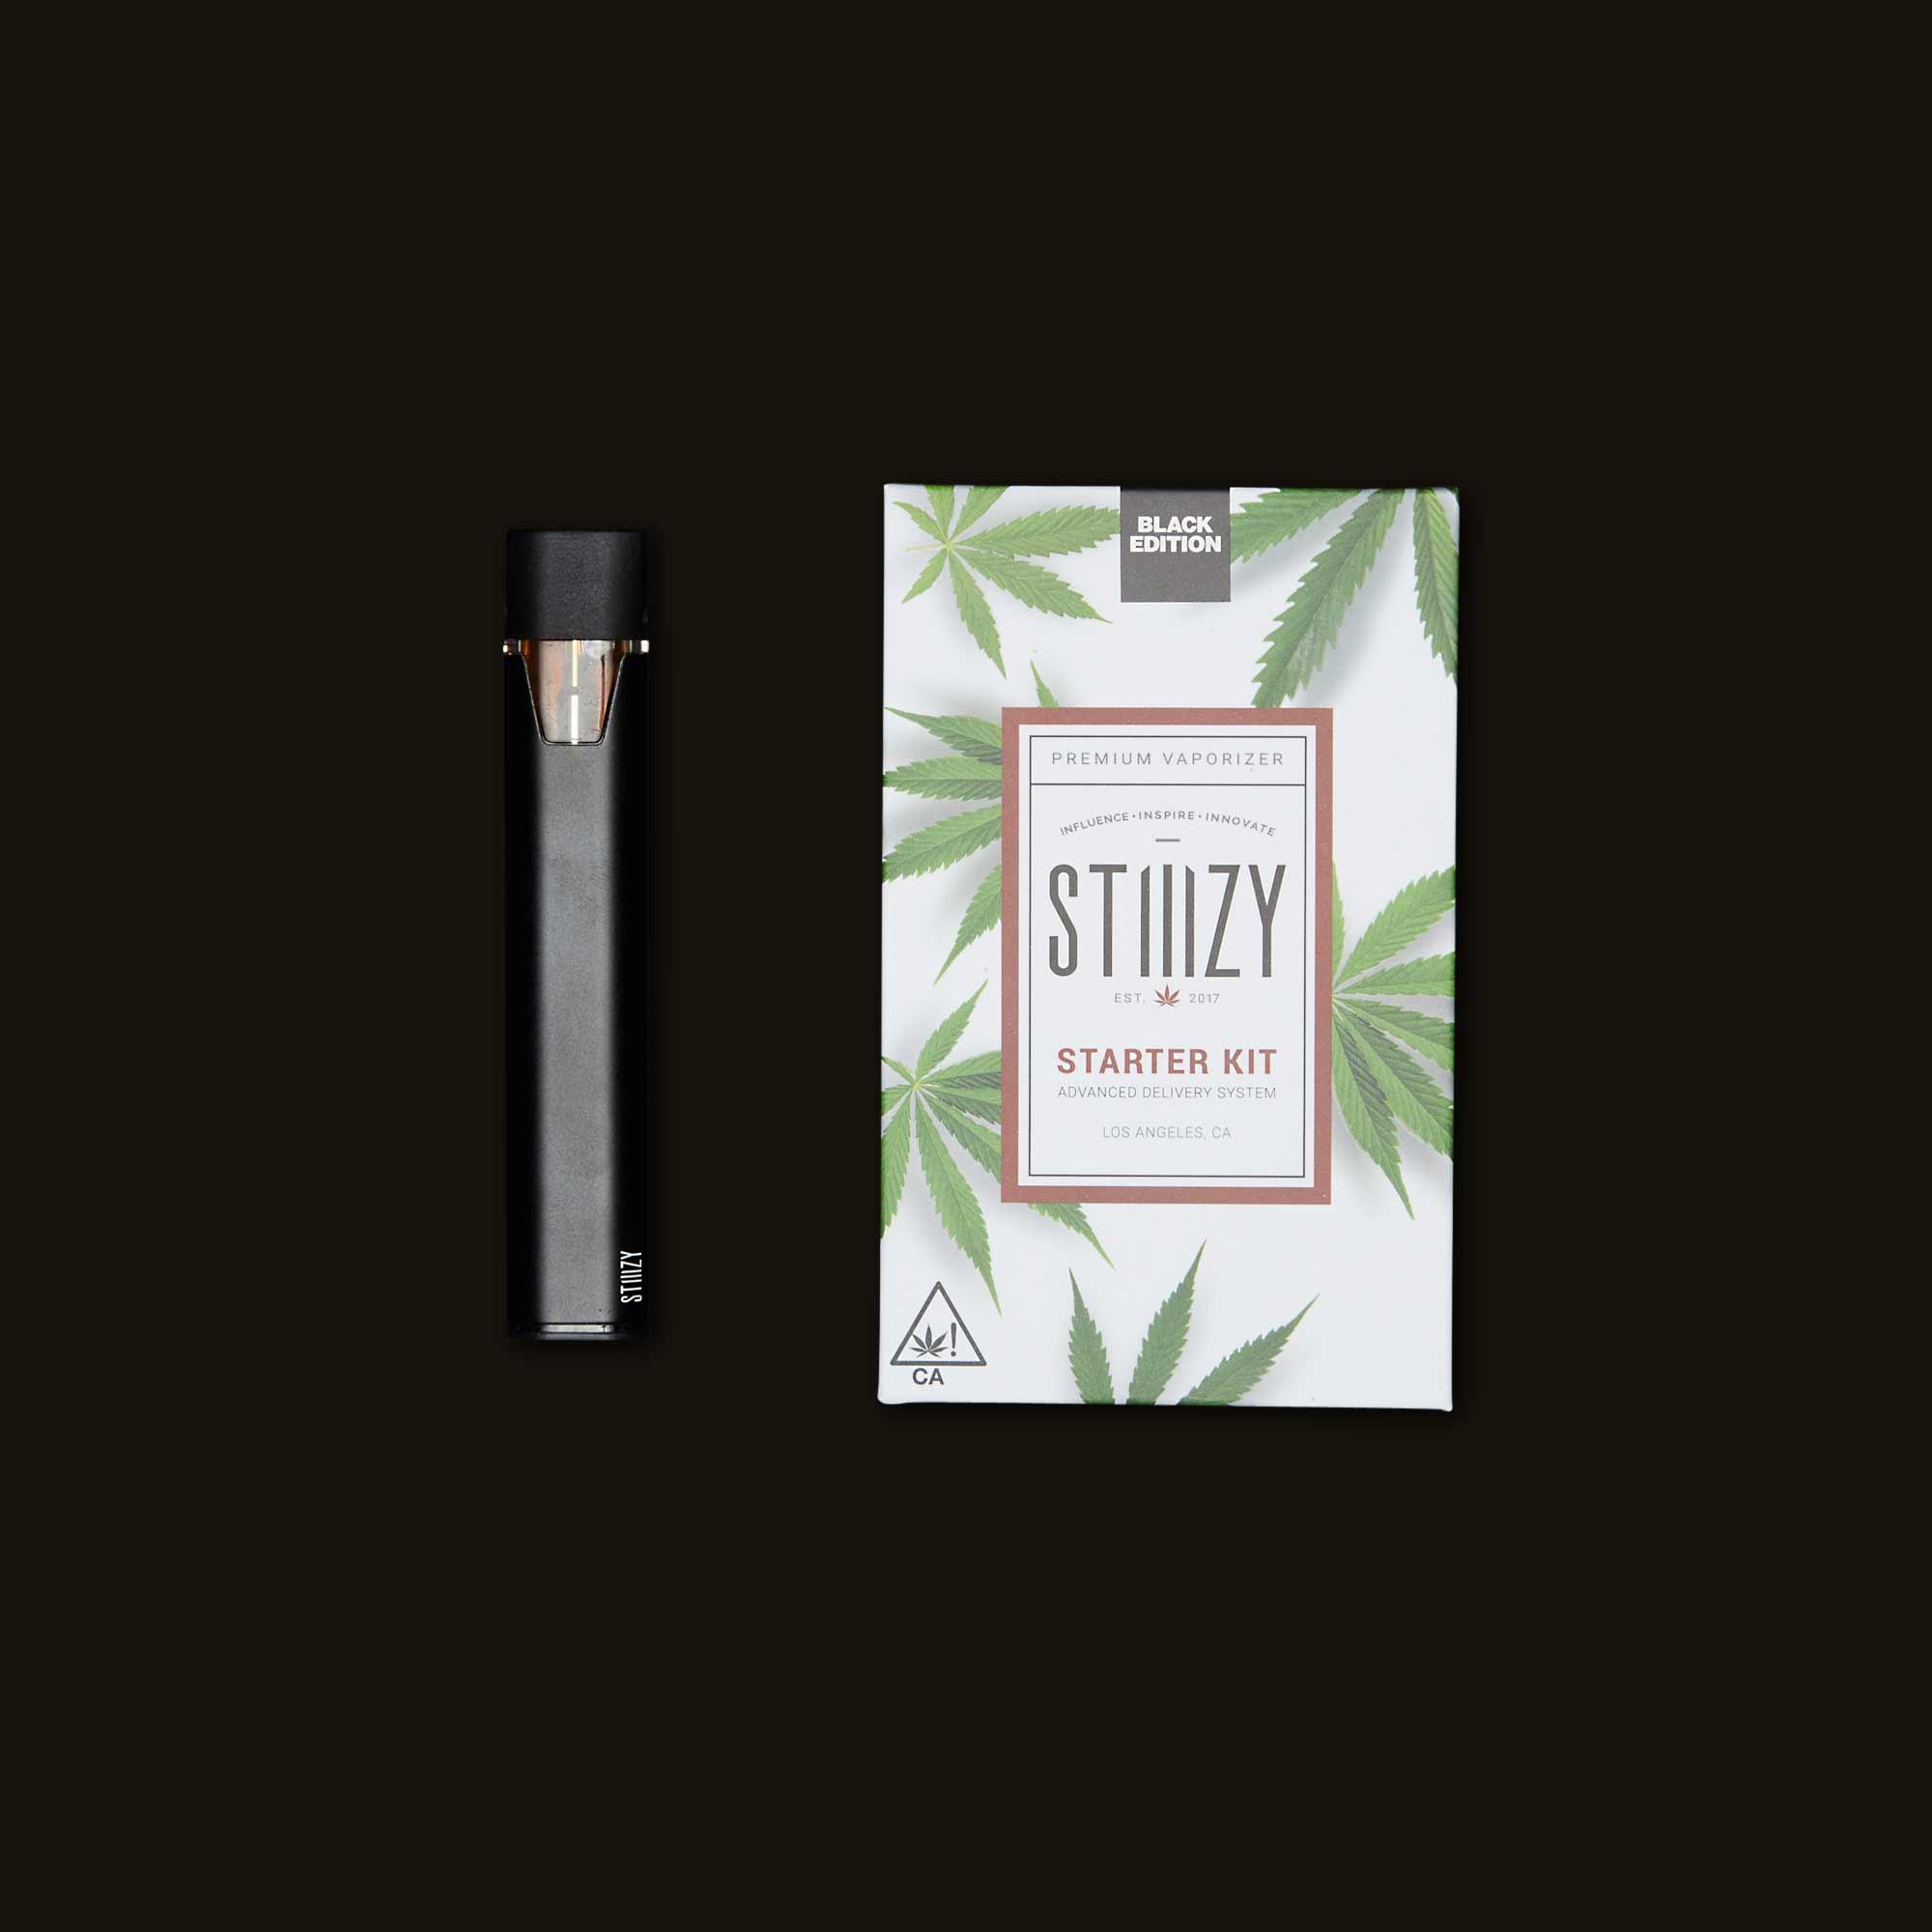 Stiiizy Stiiizy Starter Kit